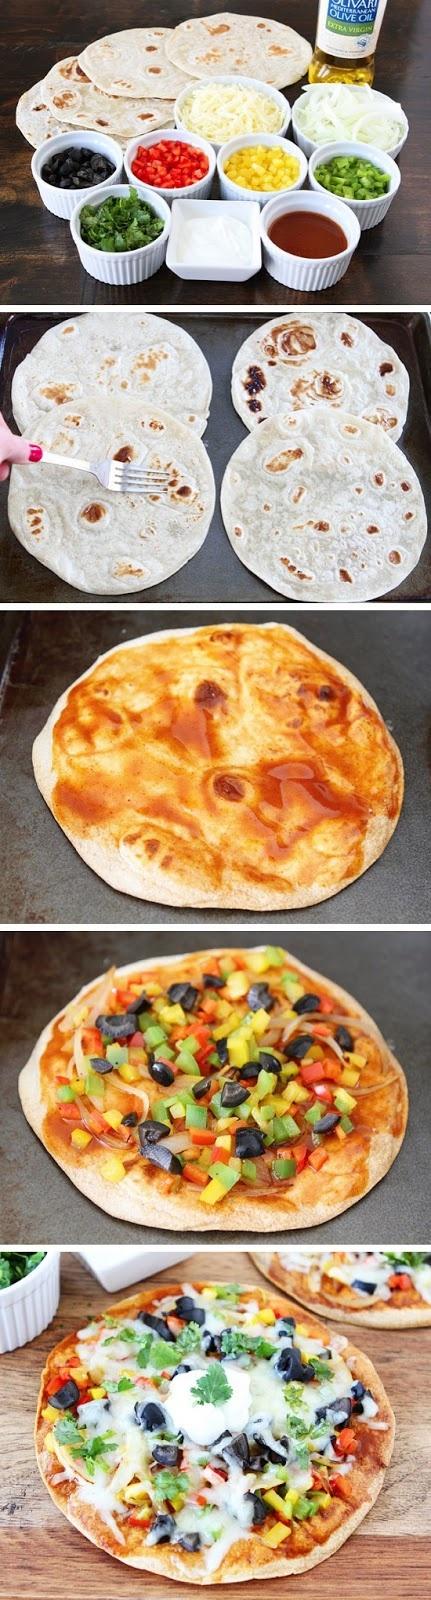 Open-Faced Enchilada Quesadillas | Recipe Sharing Community